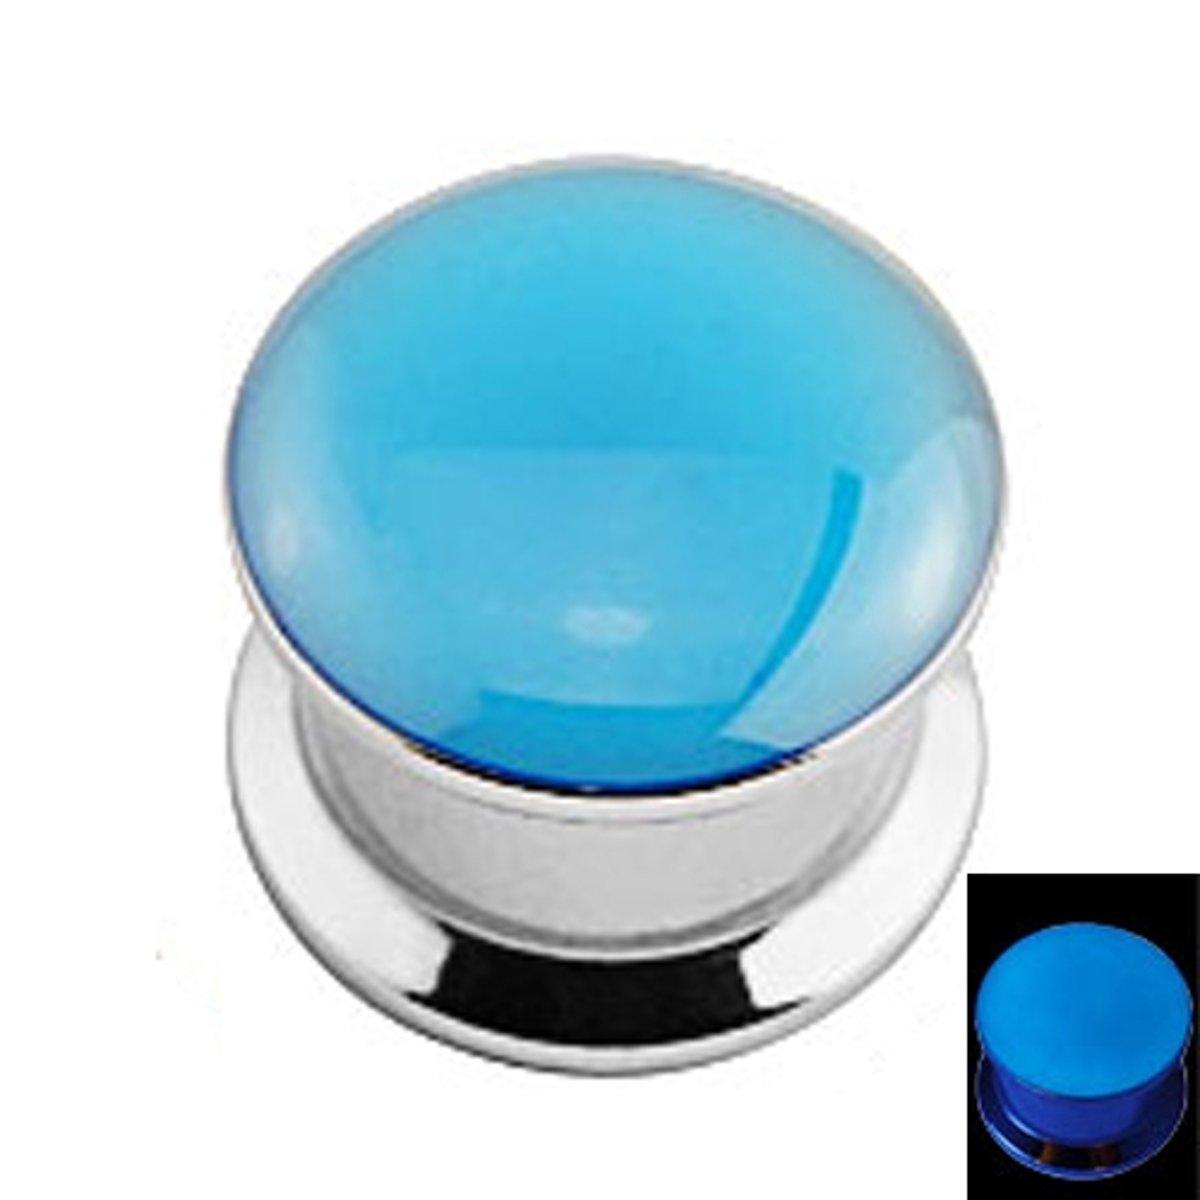 12 mm Screw-fit plug glow in the dark blauw ©LMPiercings kopen